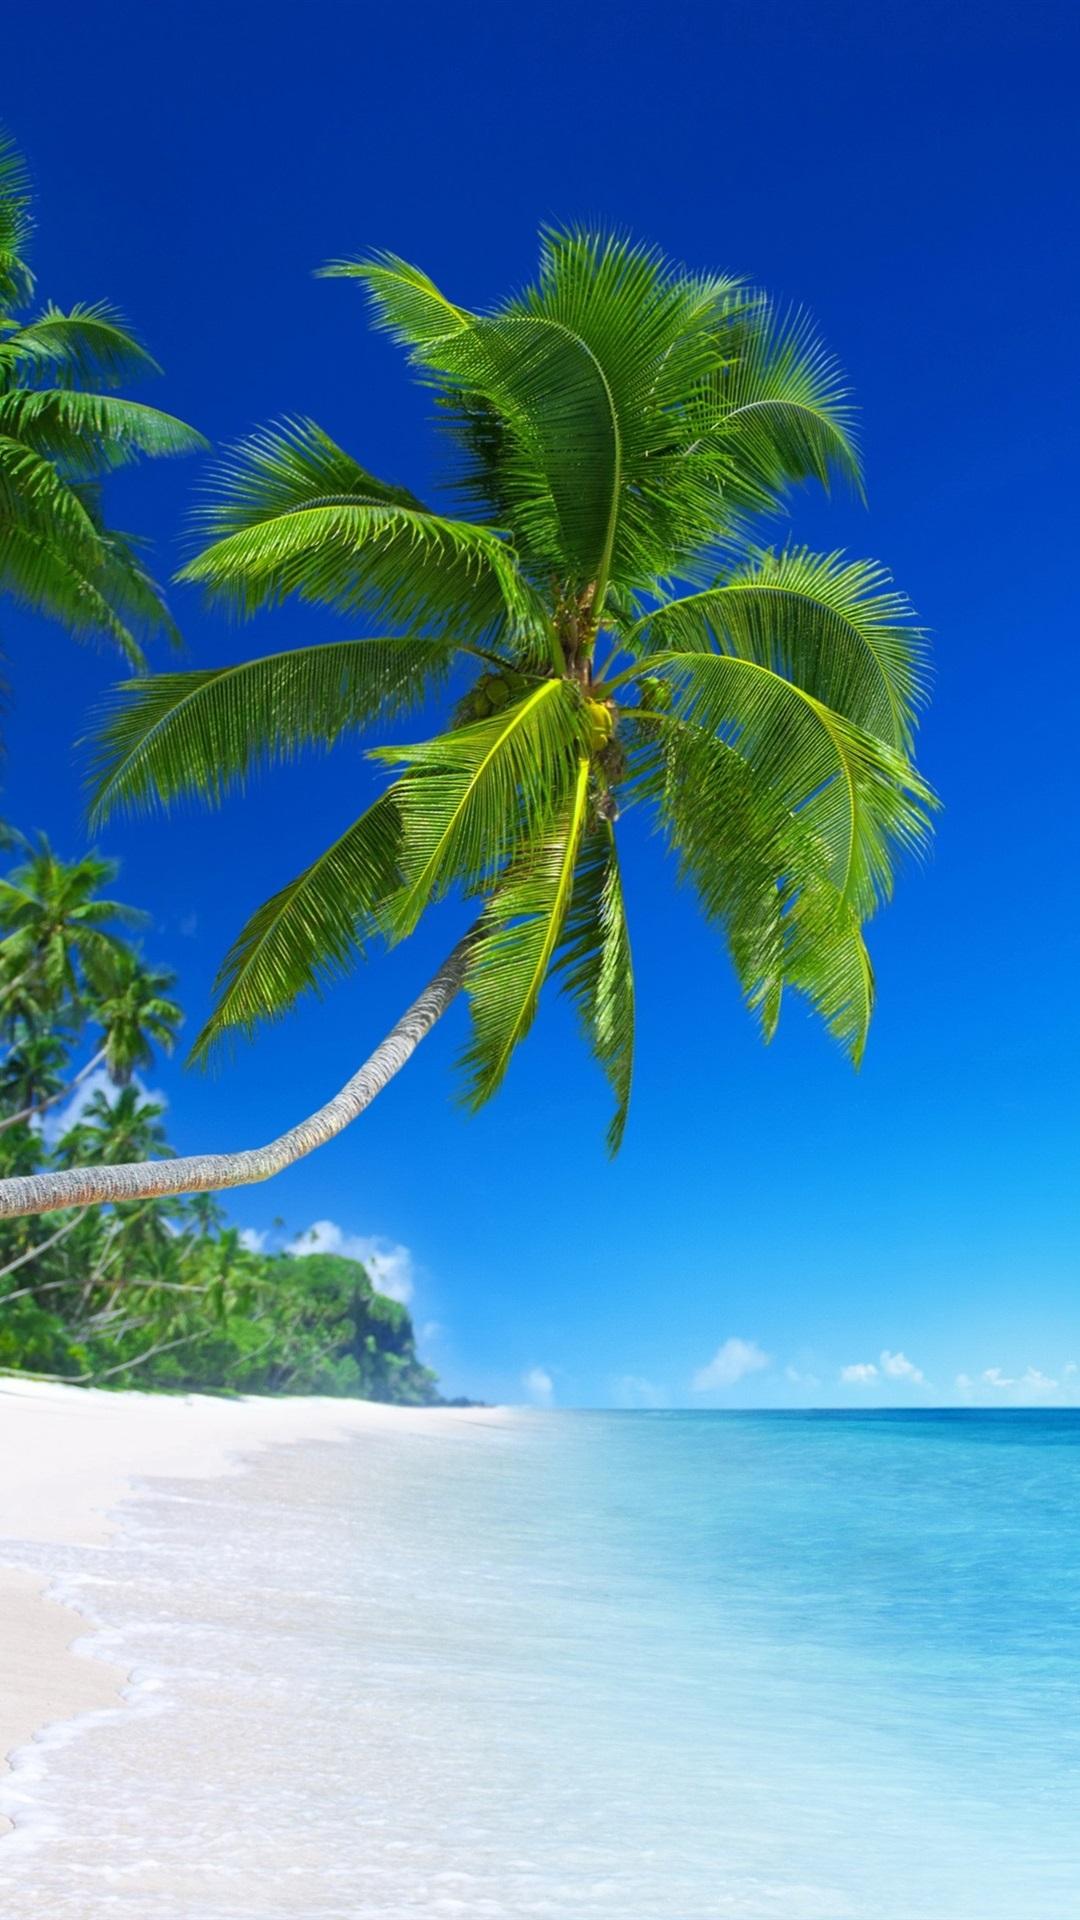 Beautiful Beach Tropical Paradise Palm Trees Blue Sea